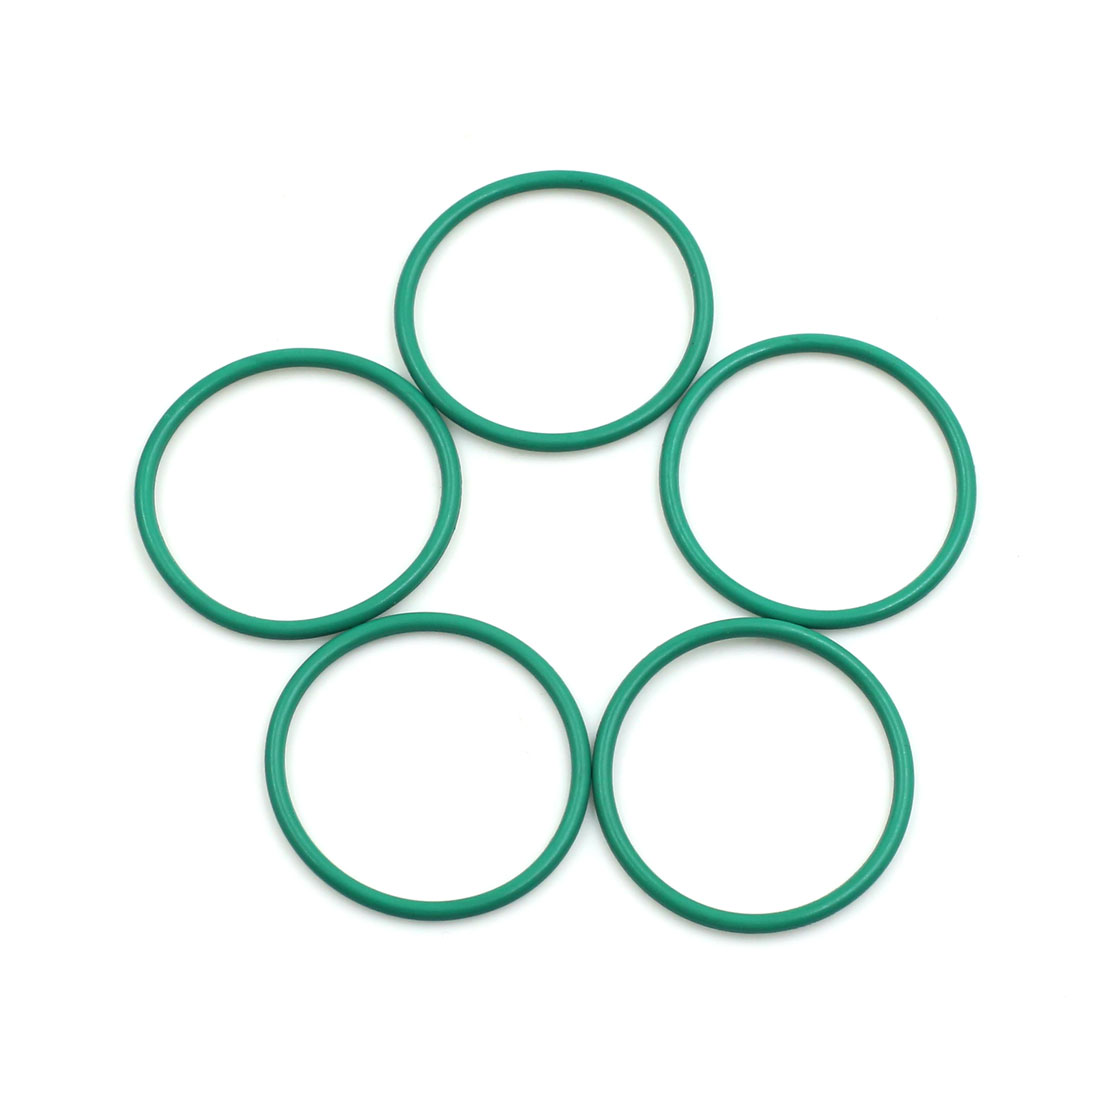 5pcs Green Universal FKM O-Ring Sealing Gasket Washer for Car 30mm x 2mm